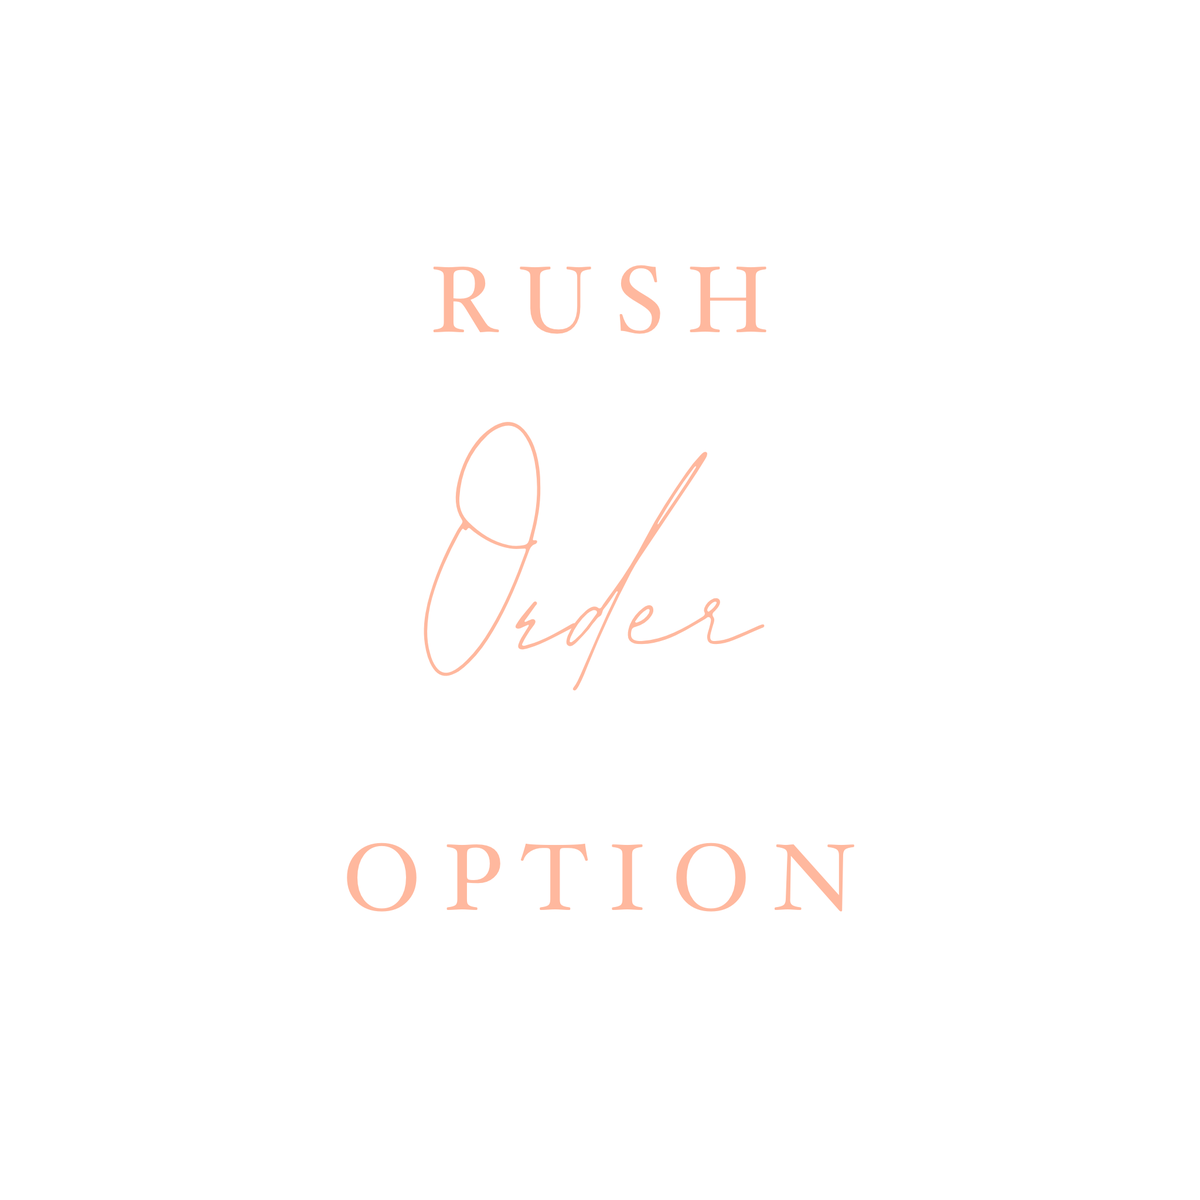 Image of Rush option